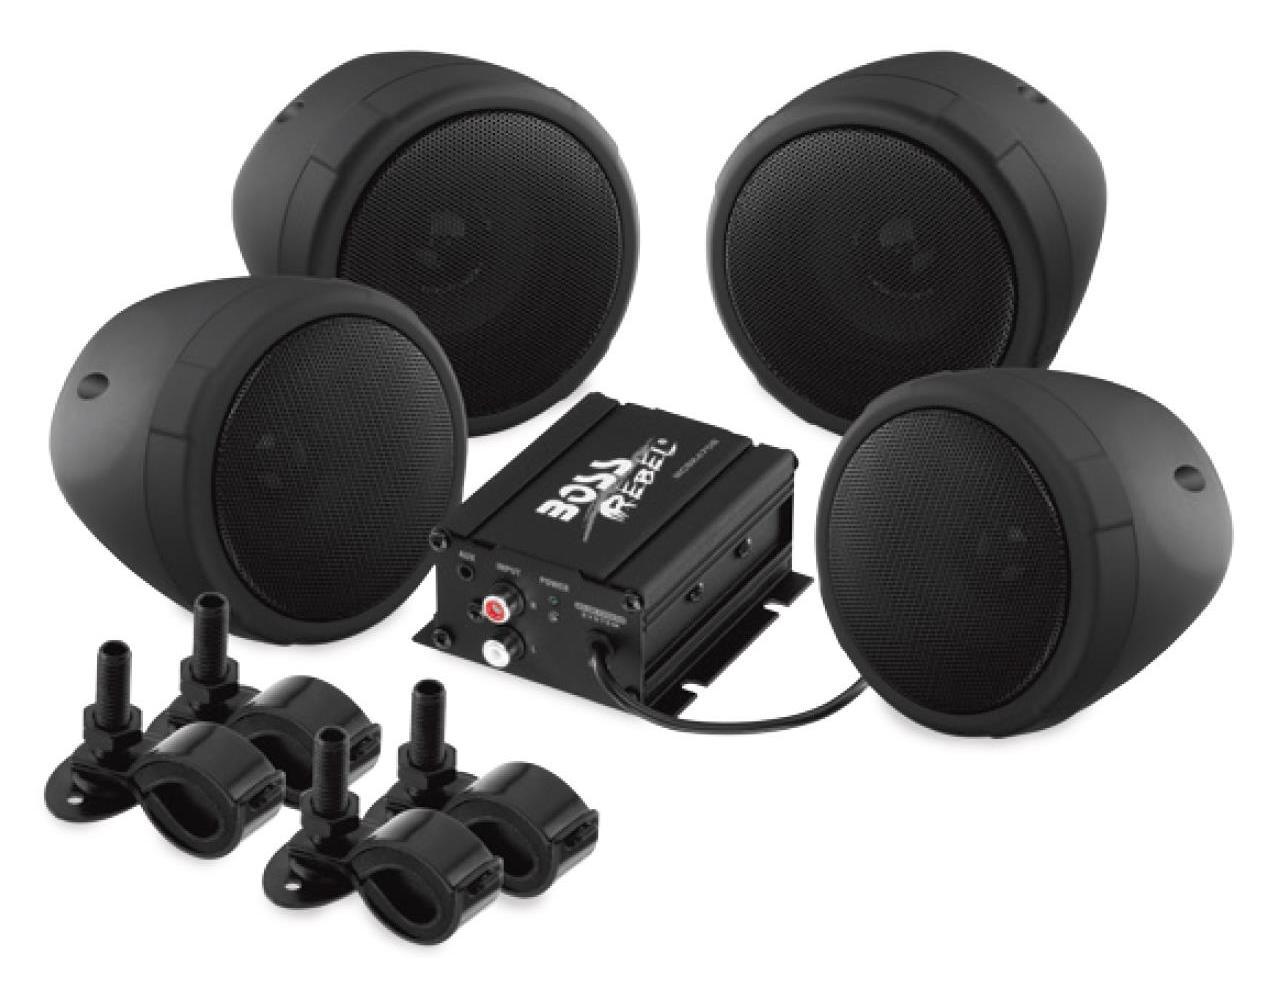 1000 Watt Speaker Kit with Bluetooth Audio Streamin Boss Audio 3in MCBK470B